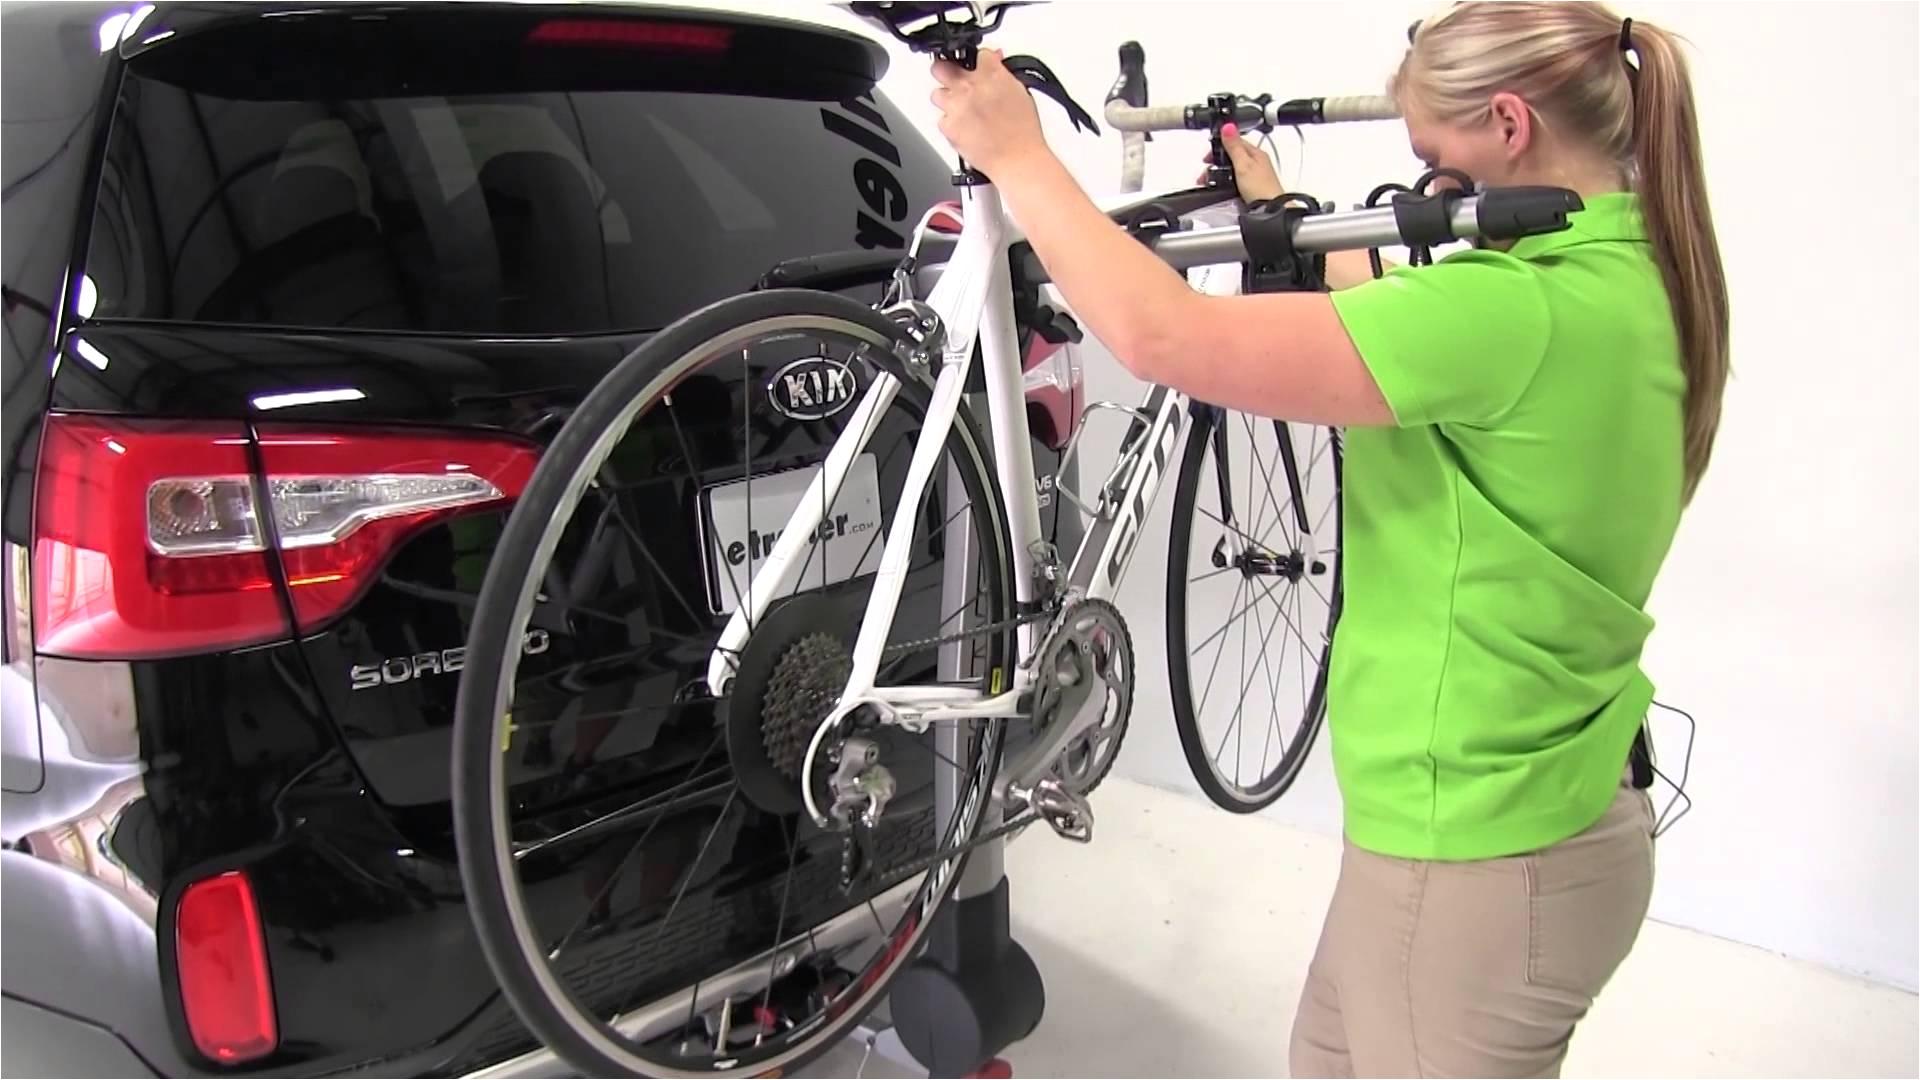 review of the yakima ridgeback hitch bike racks on a 2014 kia sorento etrailer com